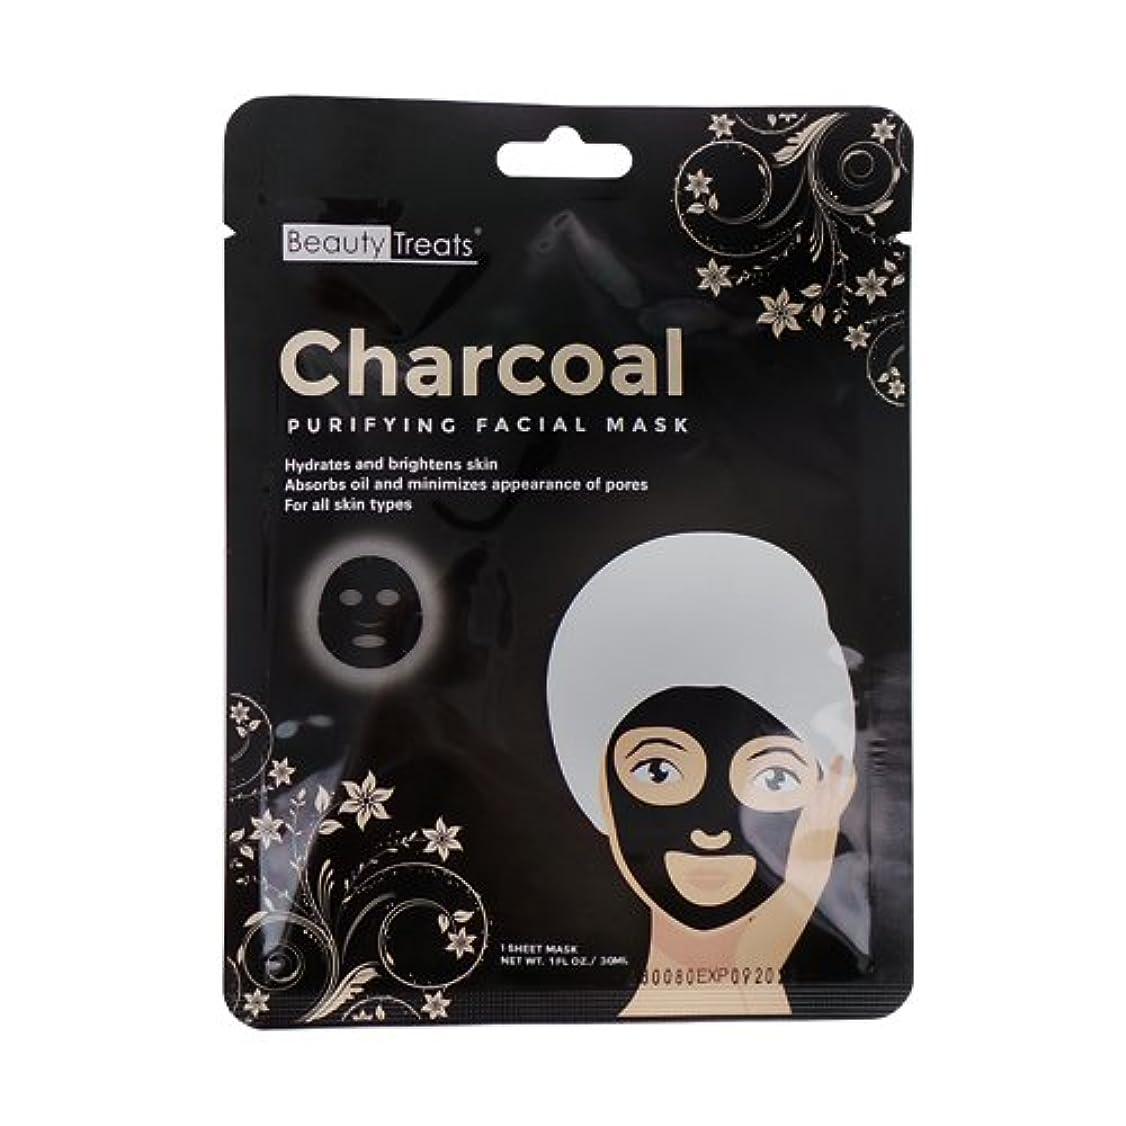 (3 Pack) BEAUTY TREATS Charcoal Purifying Facial Mask (並行輸入品)